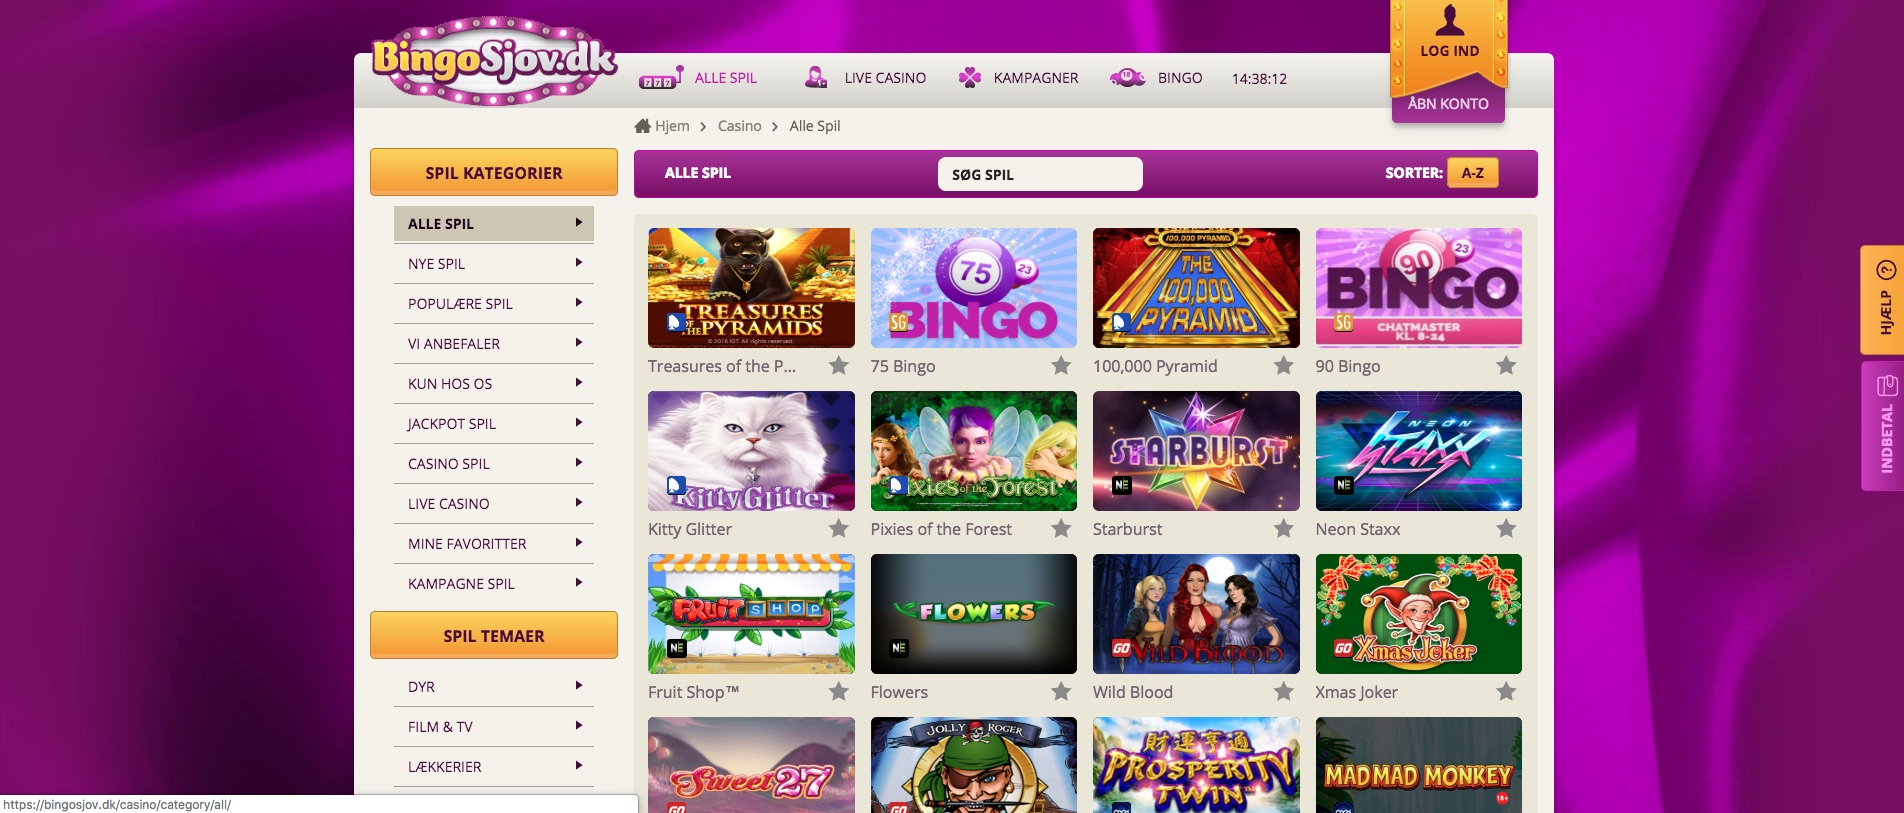 Play lucky ducky slot machine online